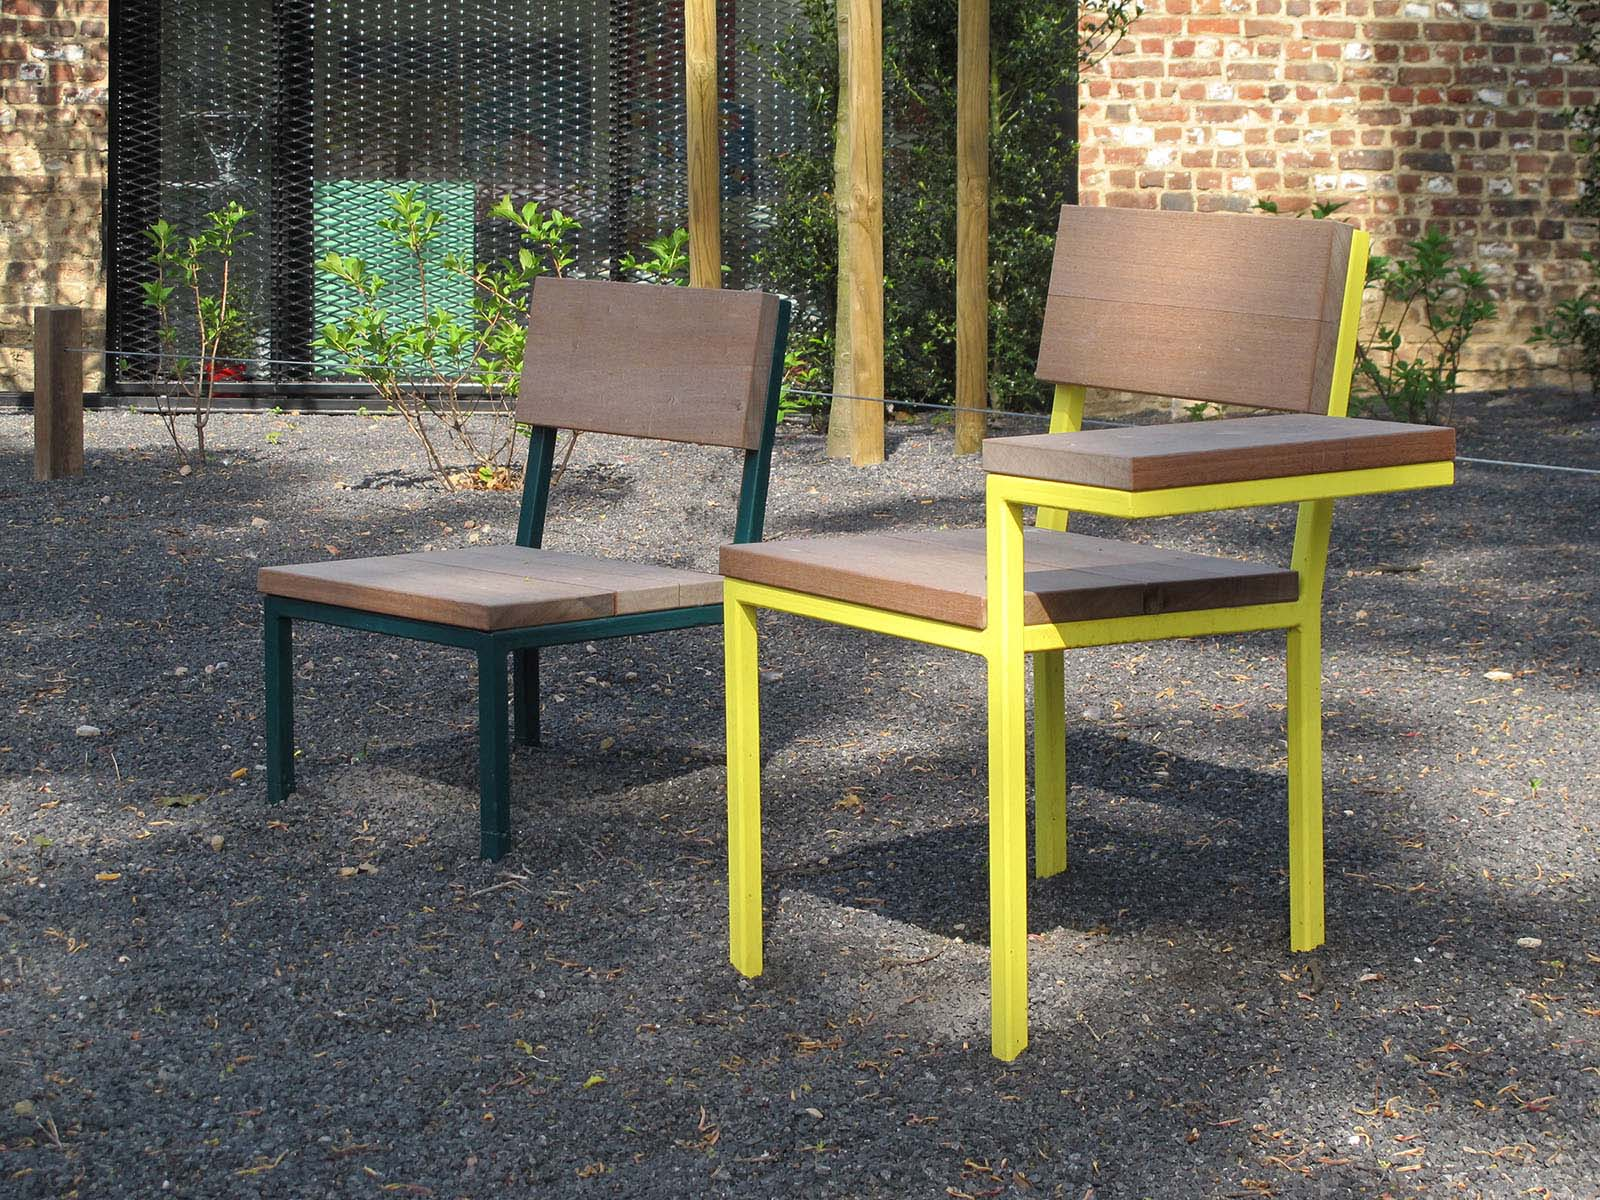 mobilier urbain_myplace_Molenbeek- Lucile Soufflet_4